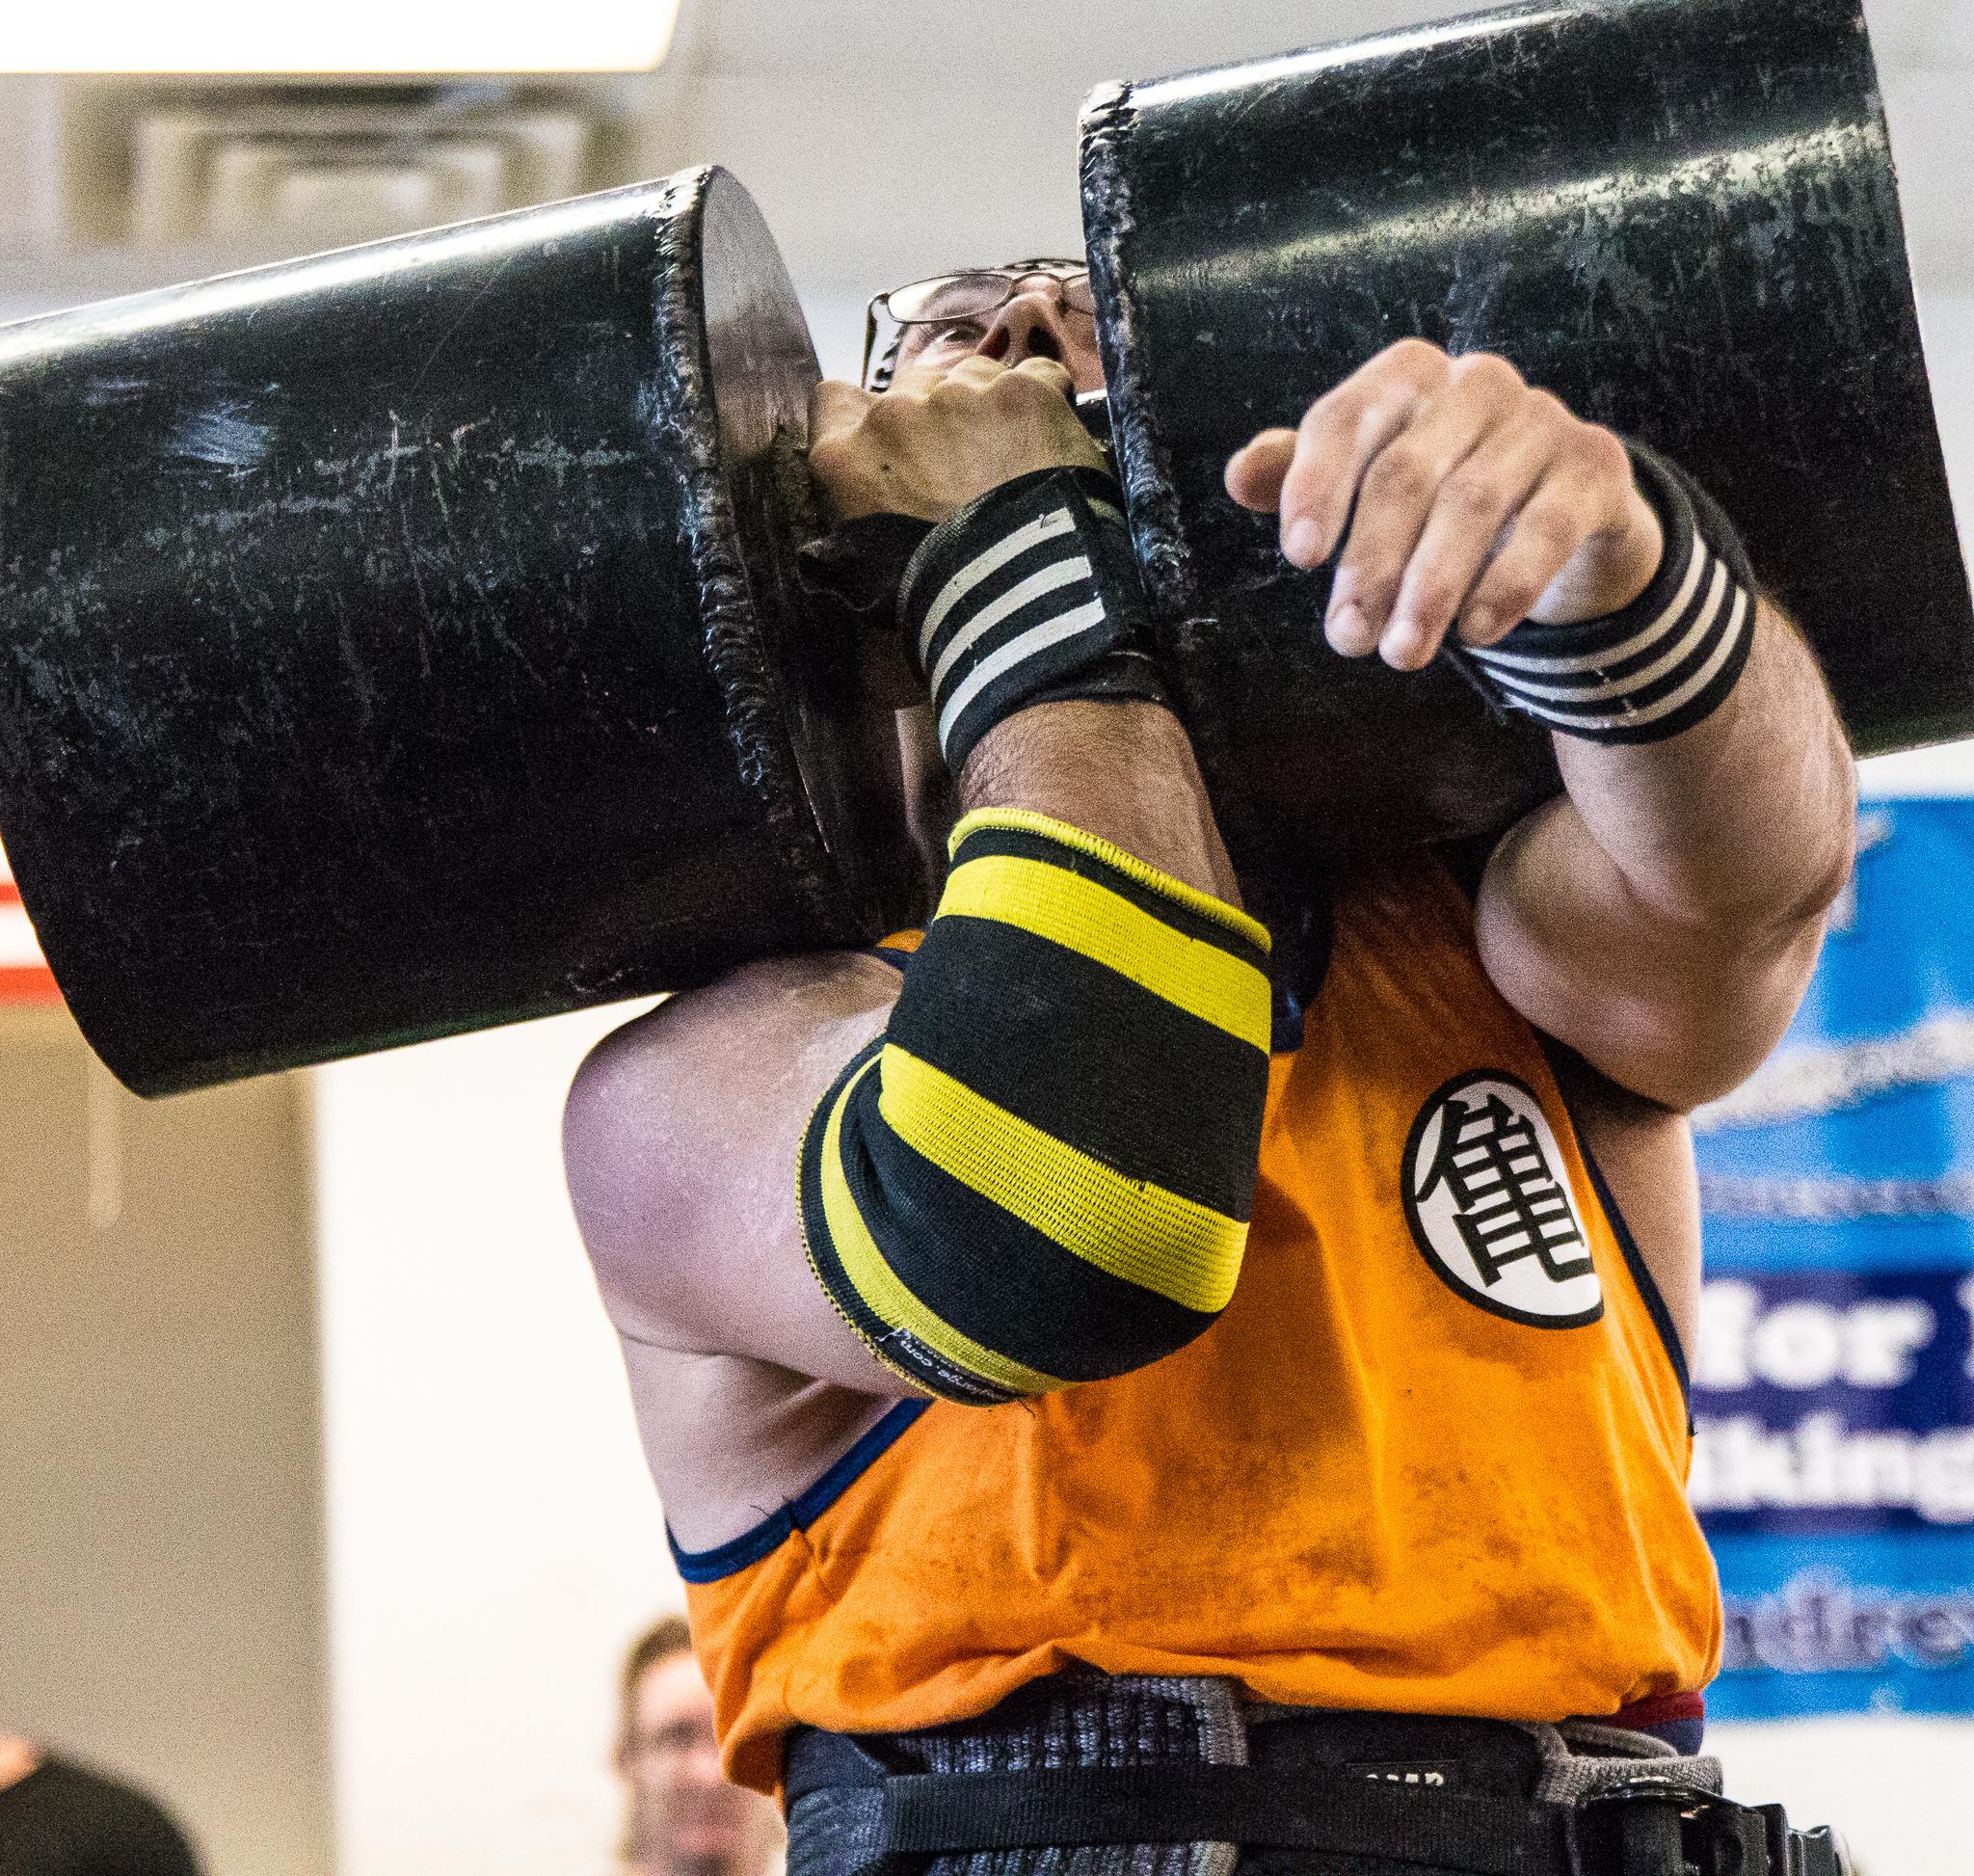 hurt-performance-4th-annual-little-viking-charity-washingtonville-new-york-strongman-eveyrdaylifters-vp (191 of 348).jpg